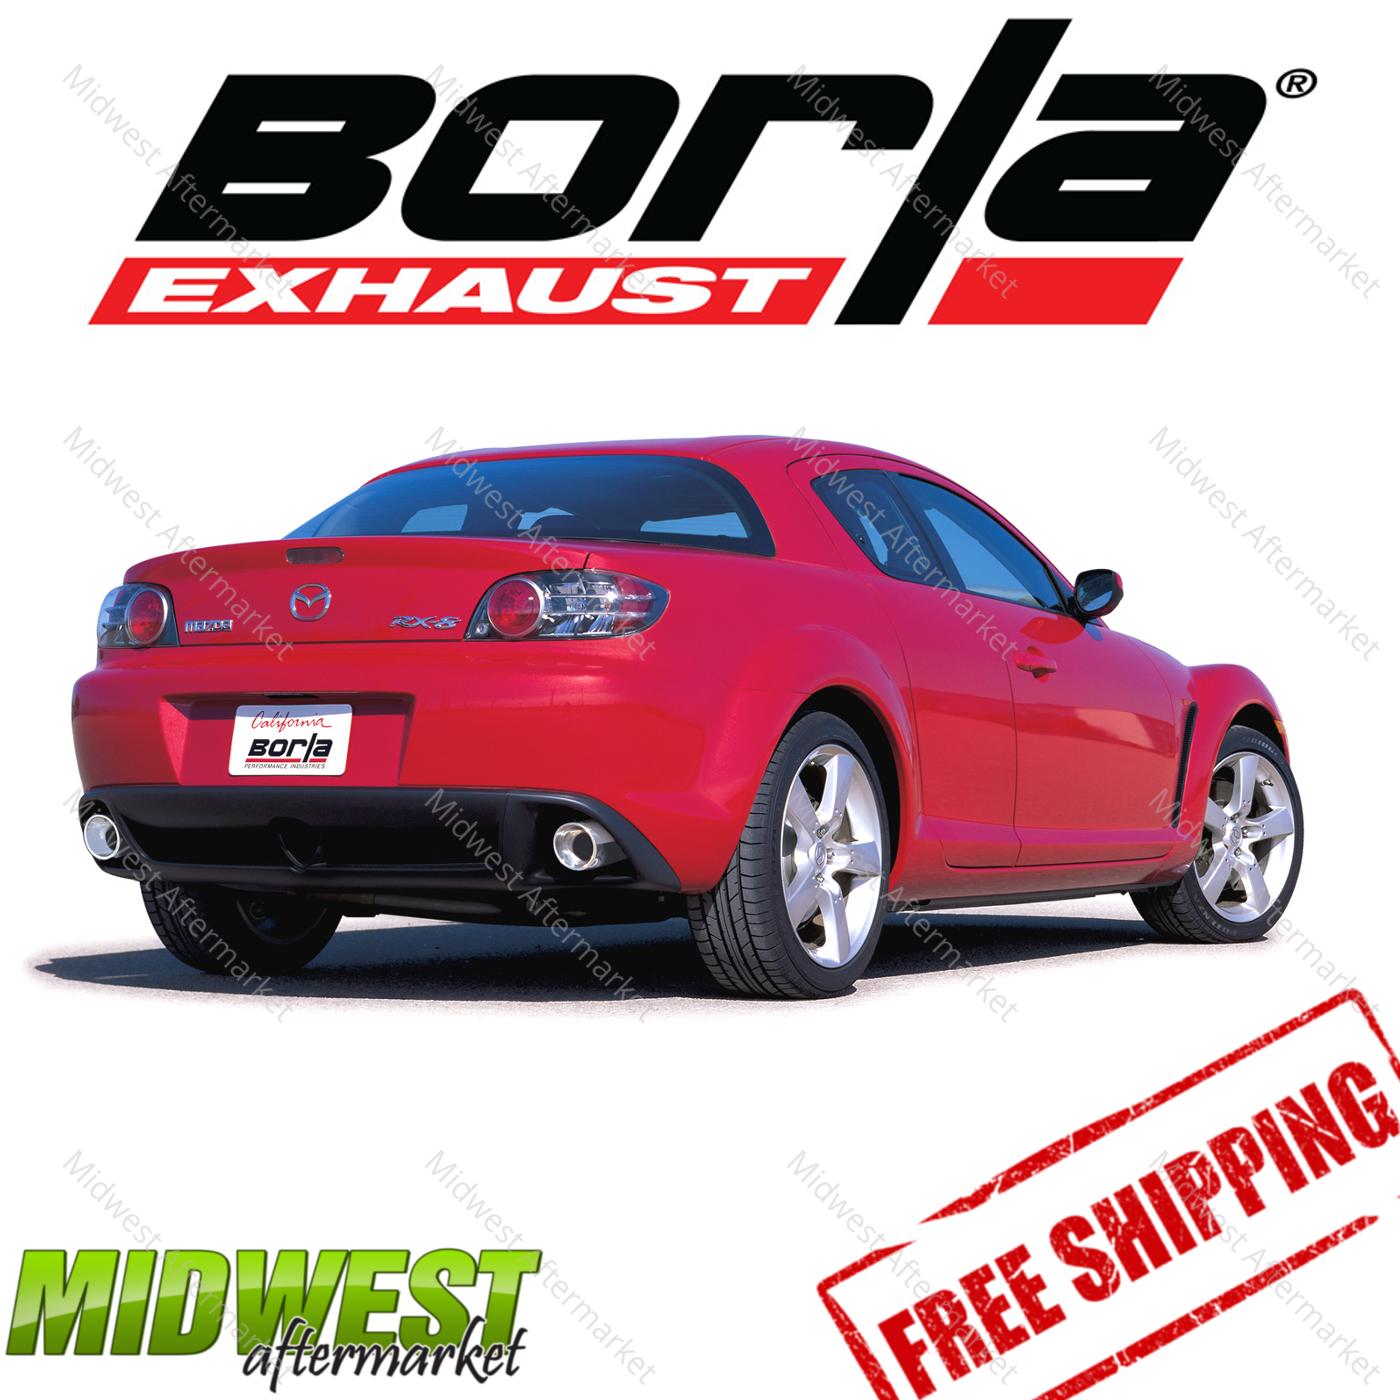 borla s type catback exhaust for 04 08 mazda rx8 1 3l wankel rotary rwd 2 door ebay. Black Bedroom Furniture Sets. Home Design Ideas